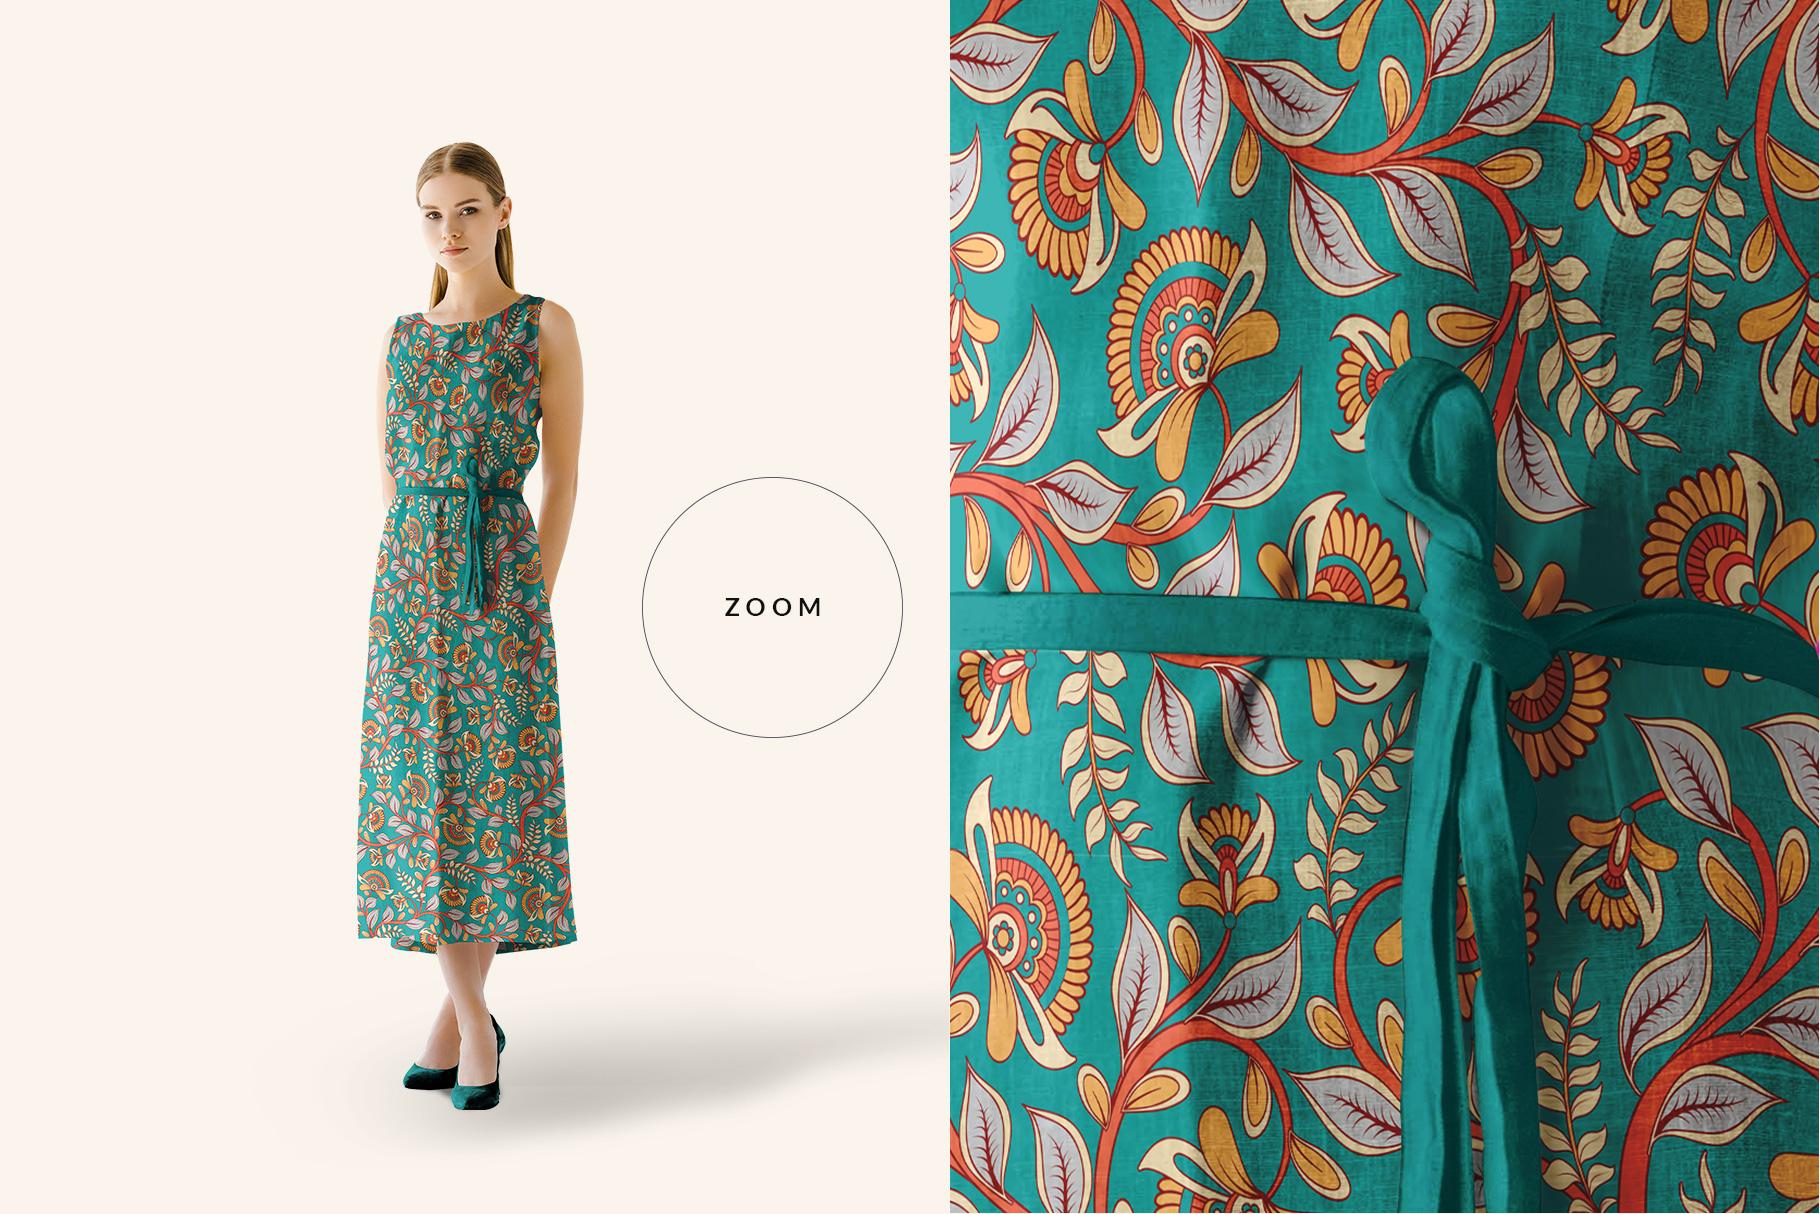 zoomed in image of women's sleeveless summer dress mockup